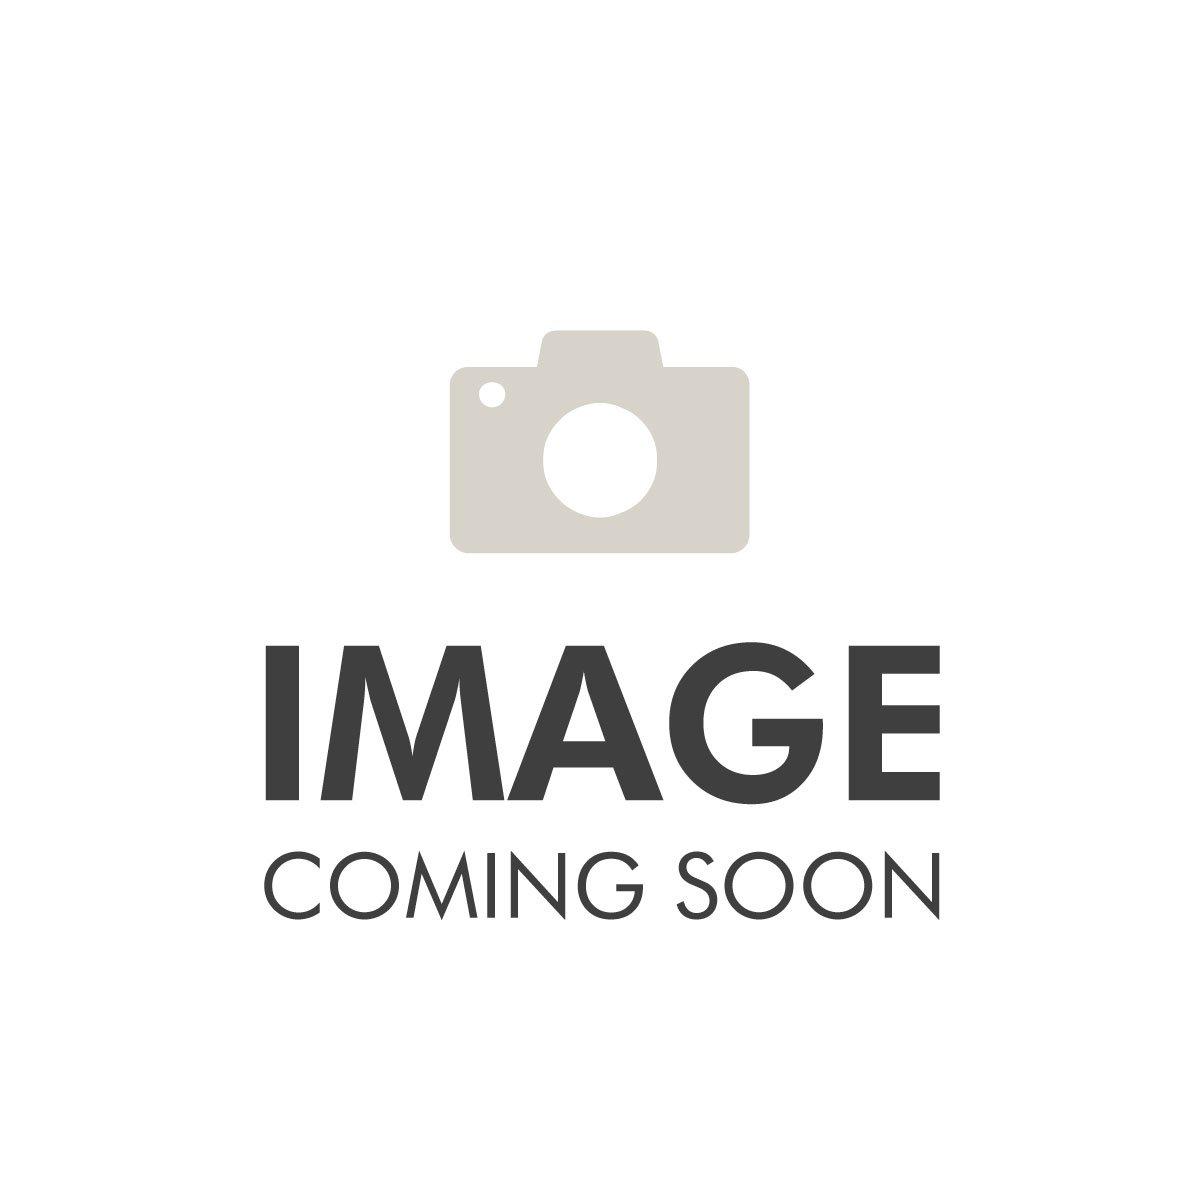 Givenchy Gentleman 100ml EDT Spray